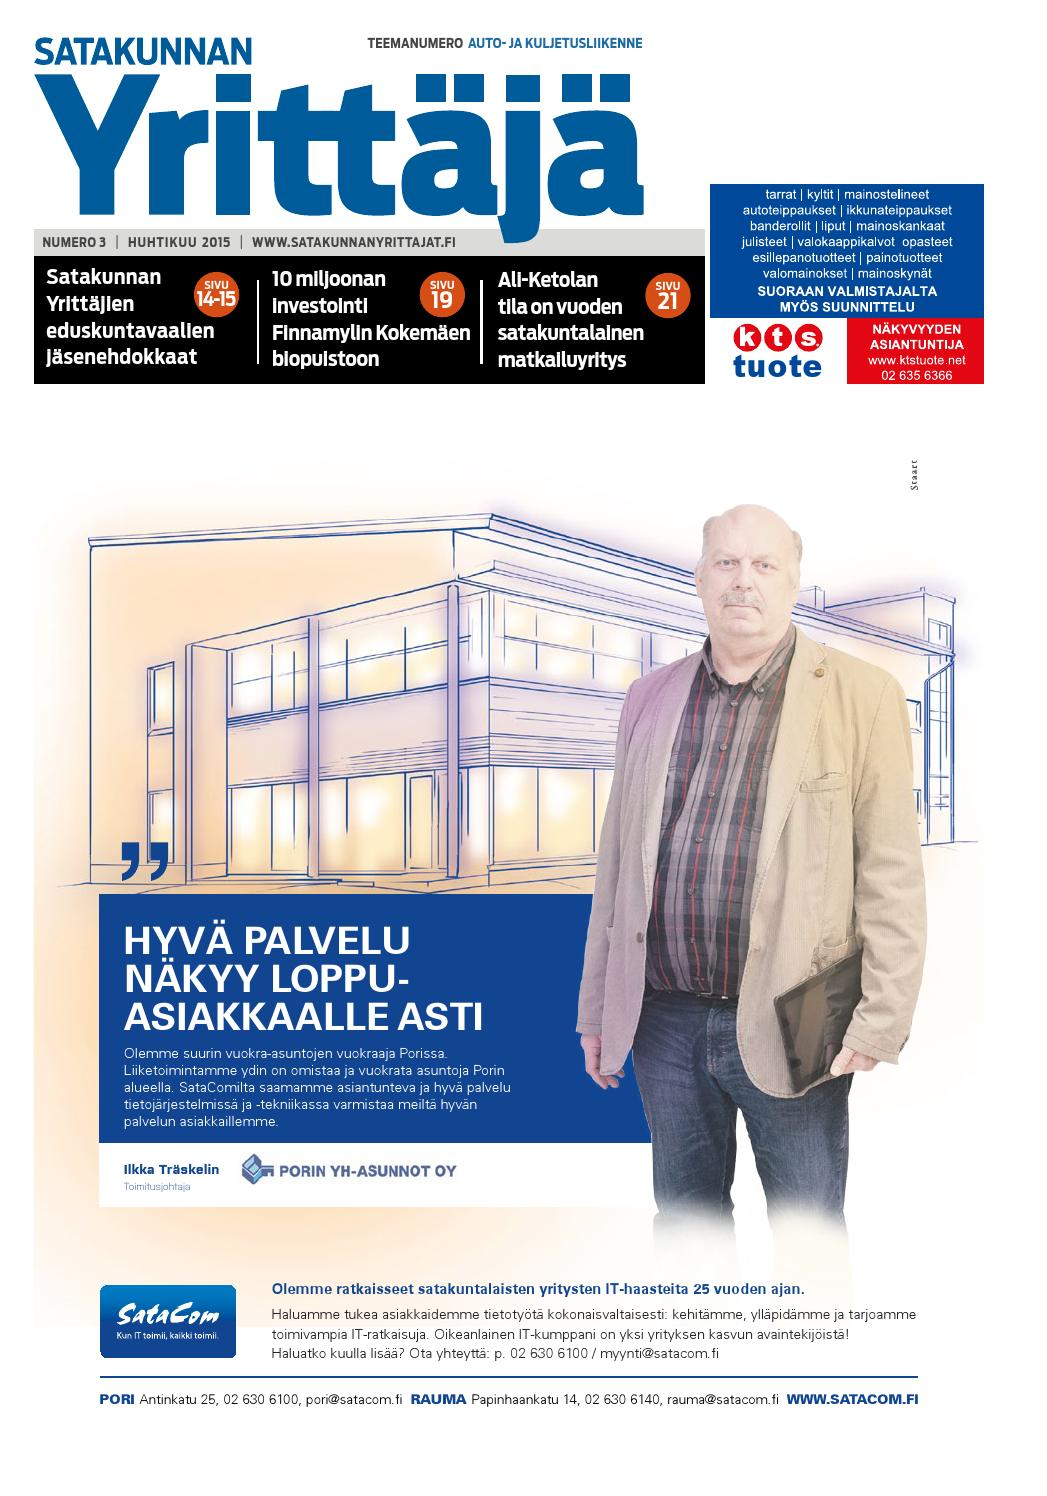 Satakunnan Yrittäjä 3 2015 by Satakunnan Yrittäjät - issuu bad3e427a5